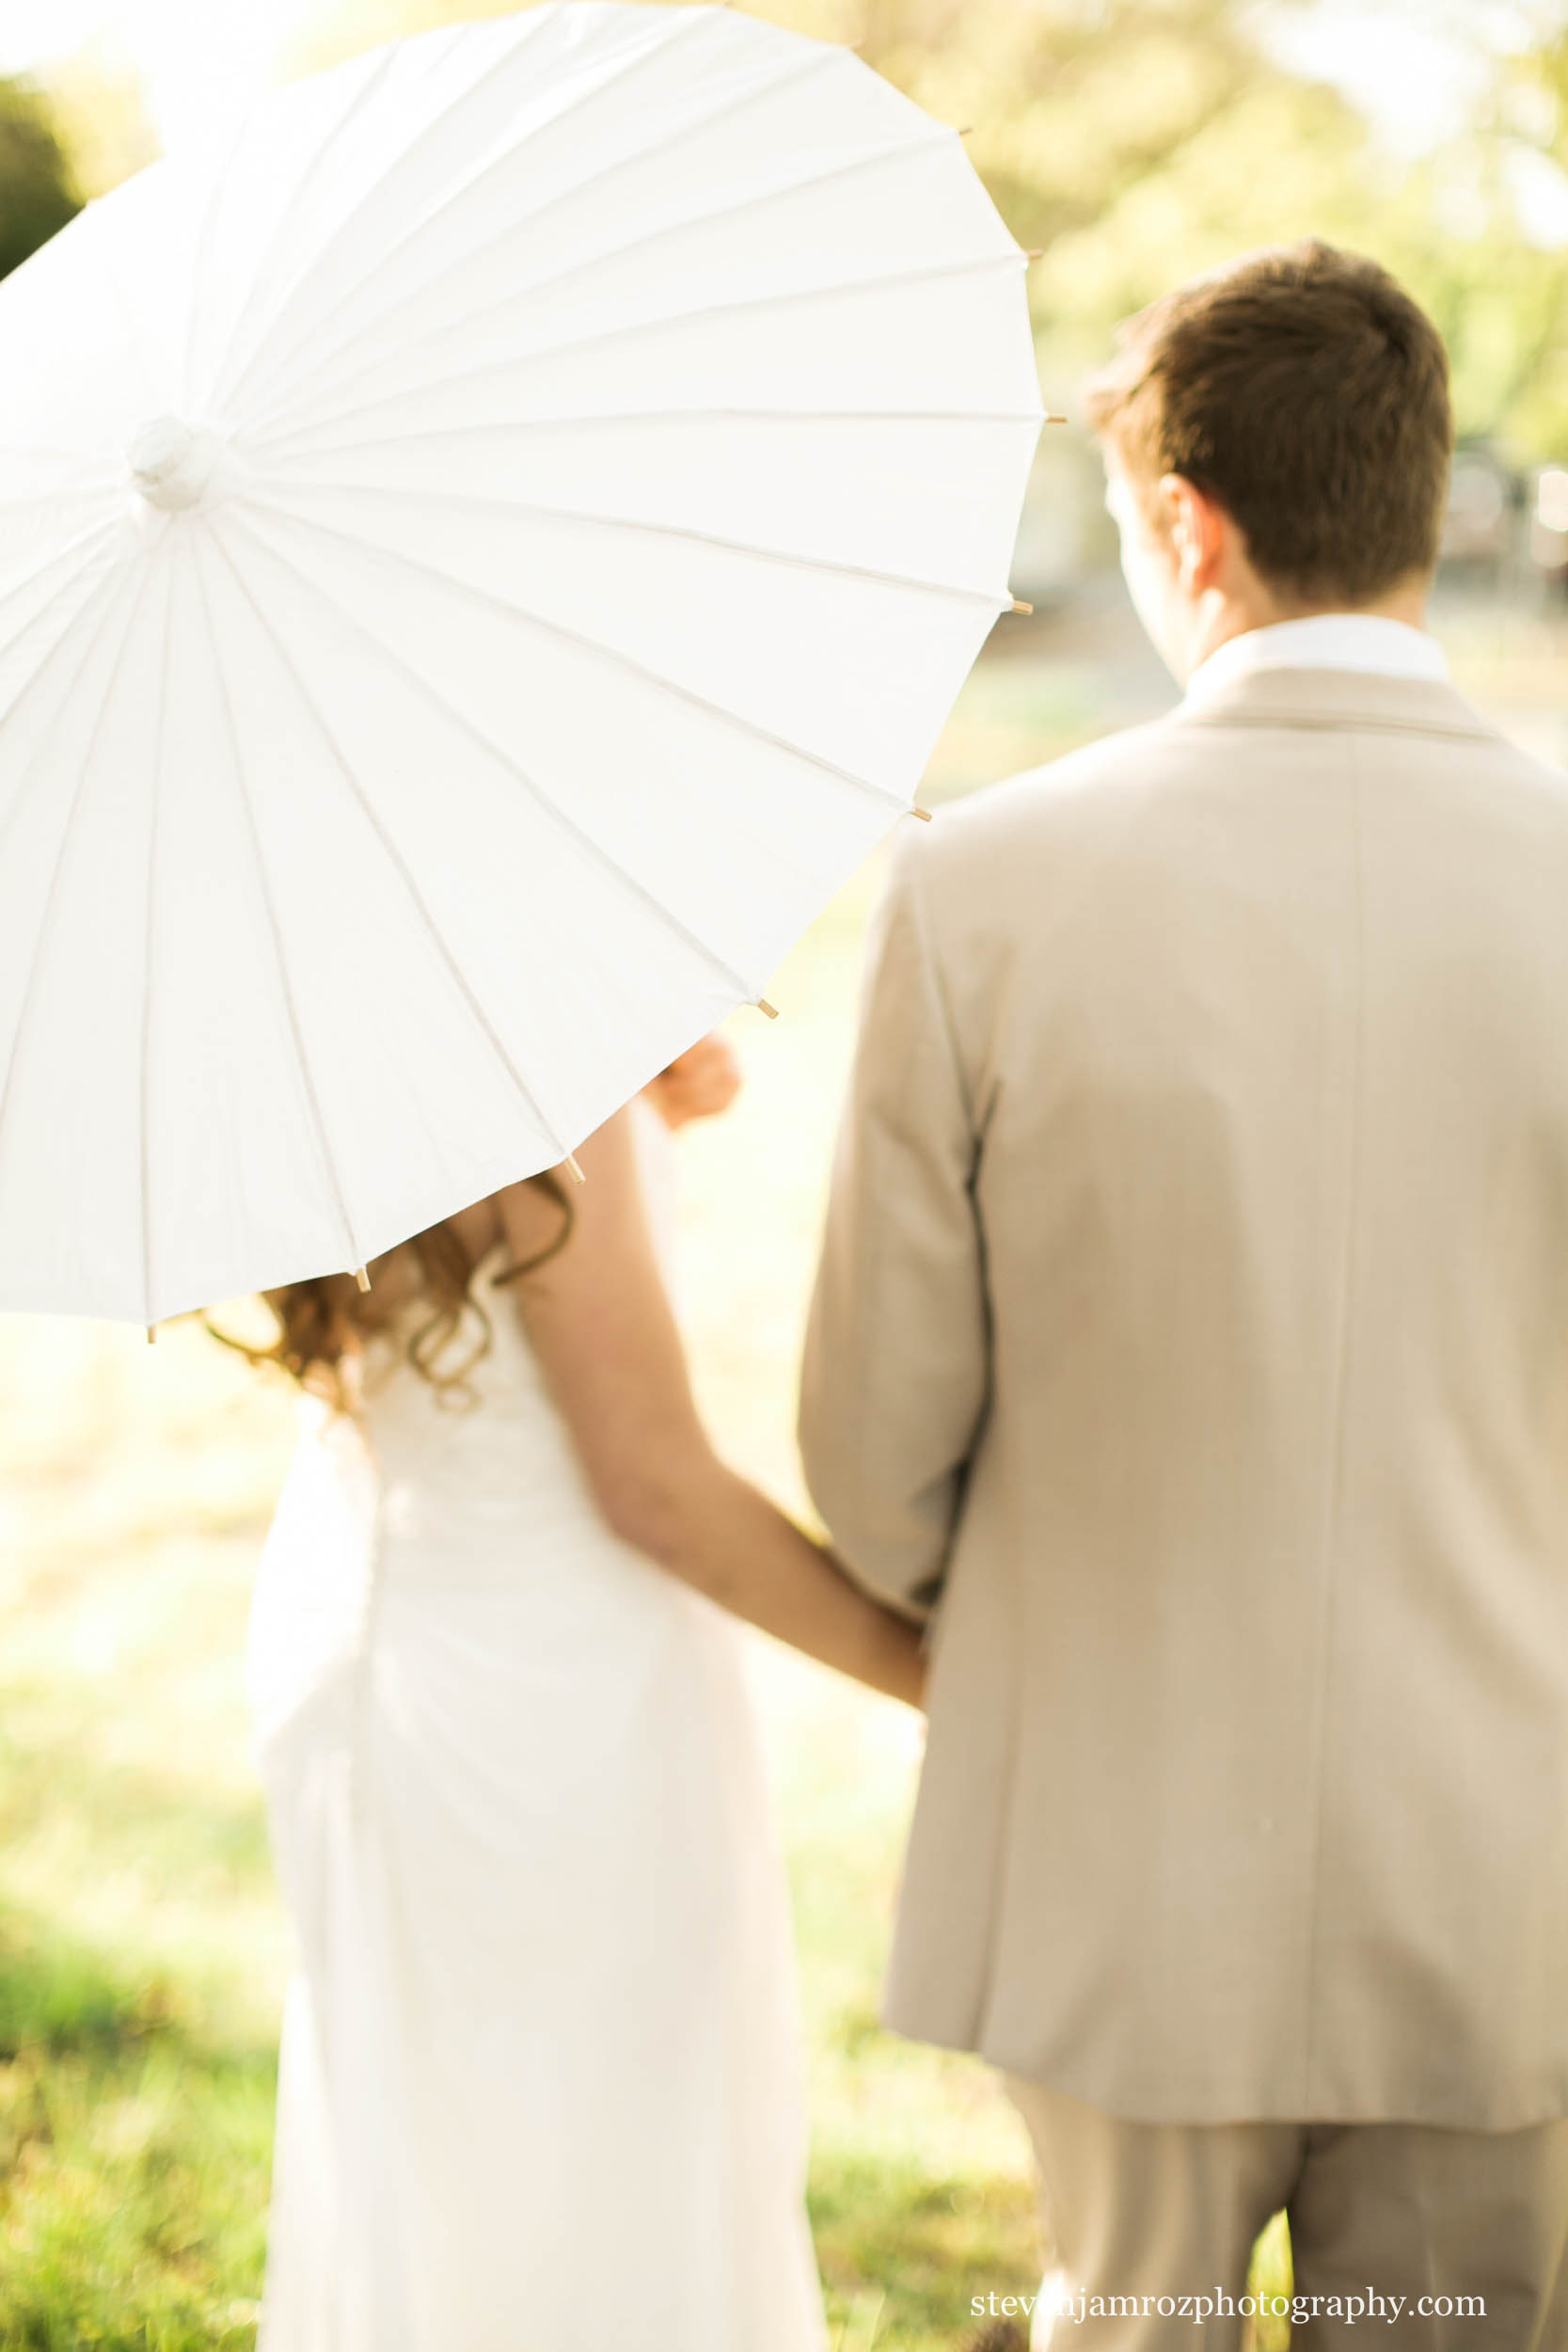 field-wedding-ceremony-cedar-grove-acres.jpg